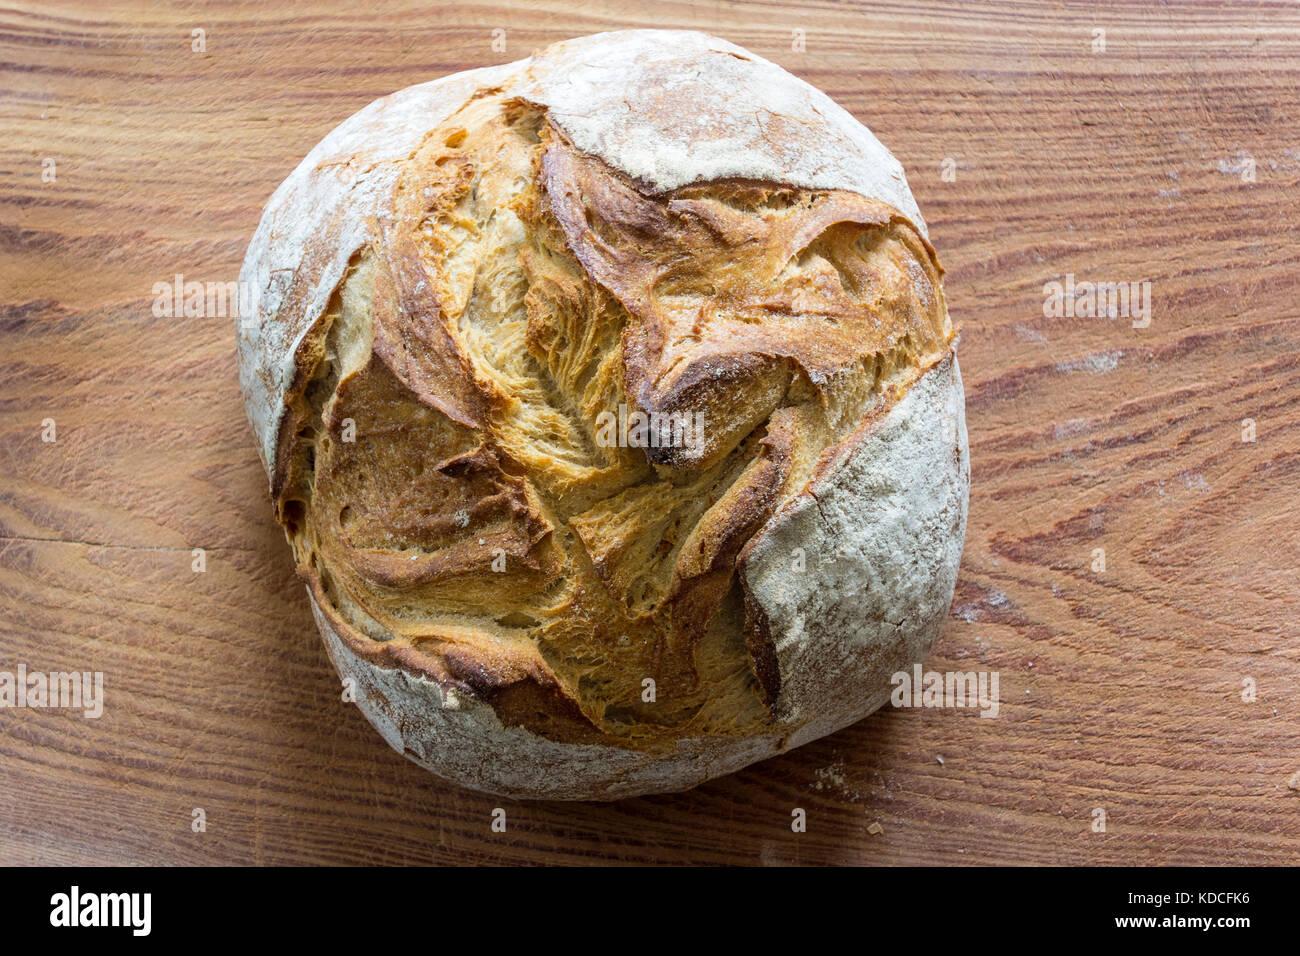 Loaf of Fresh Spelt Bread - Stock Image